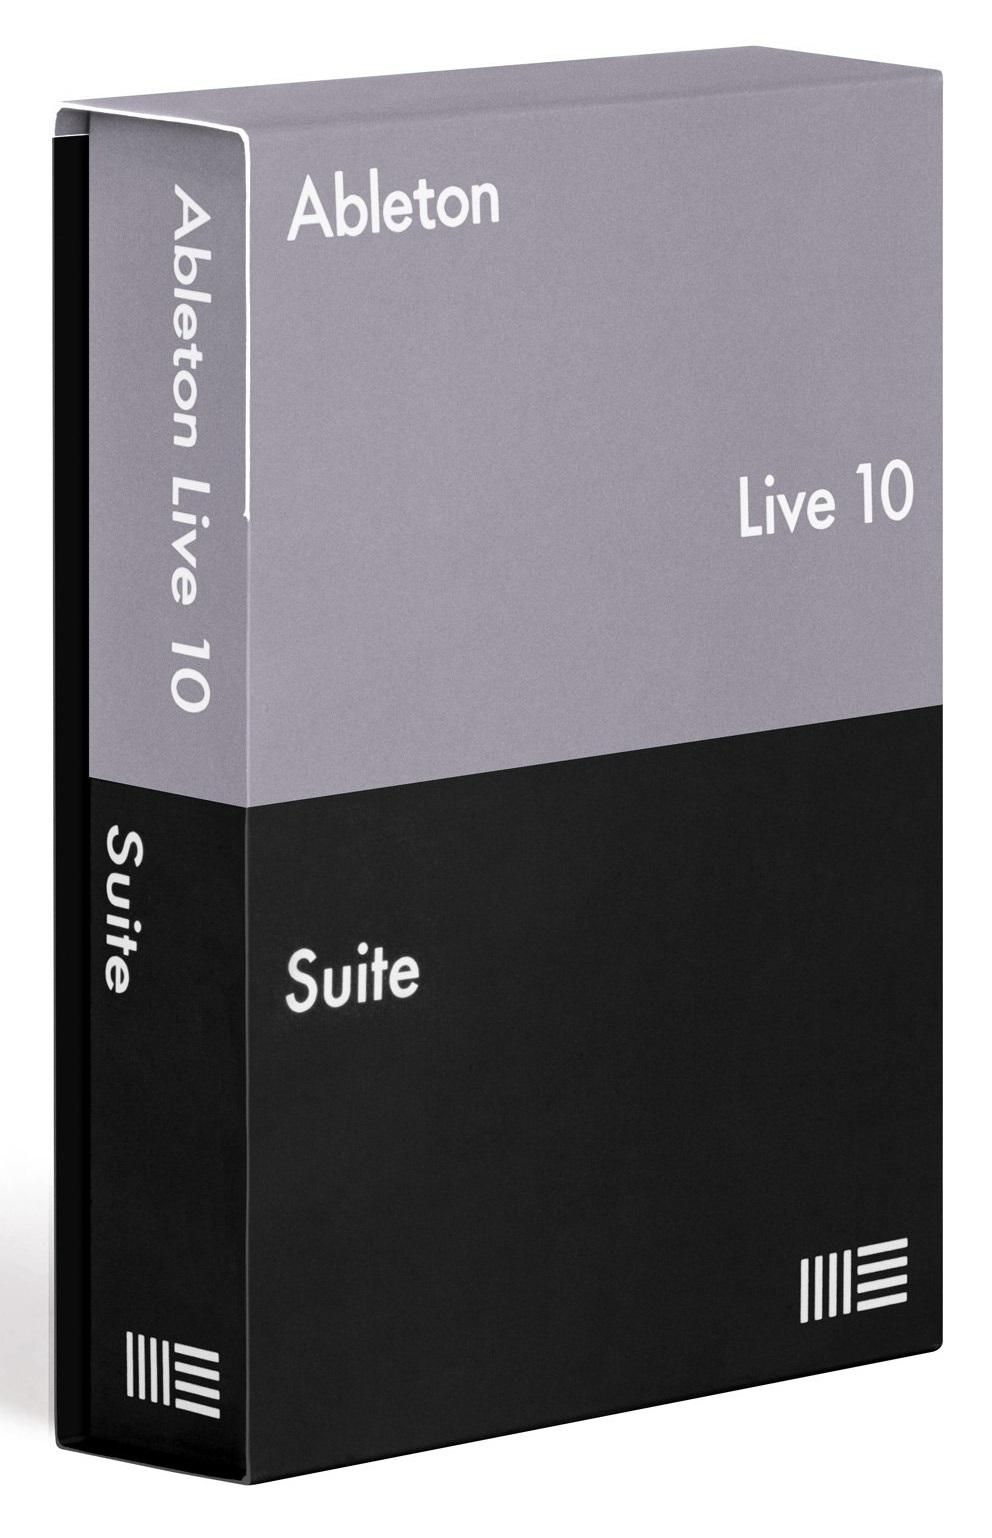 Ableton Live 10 Crack free